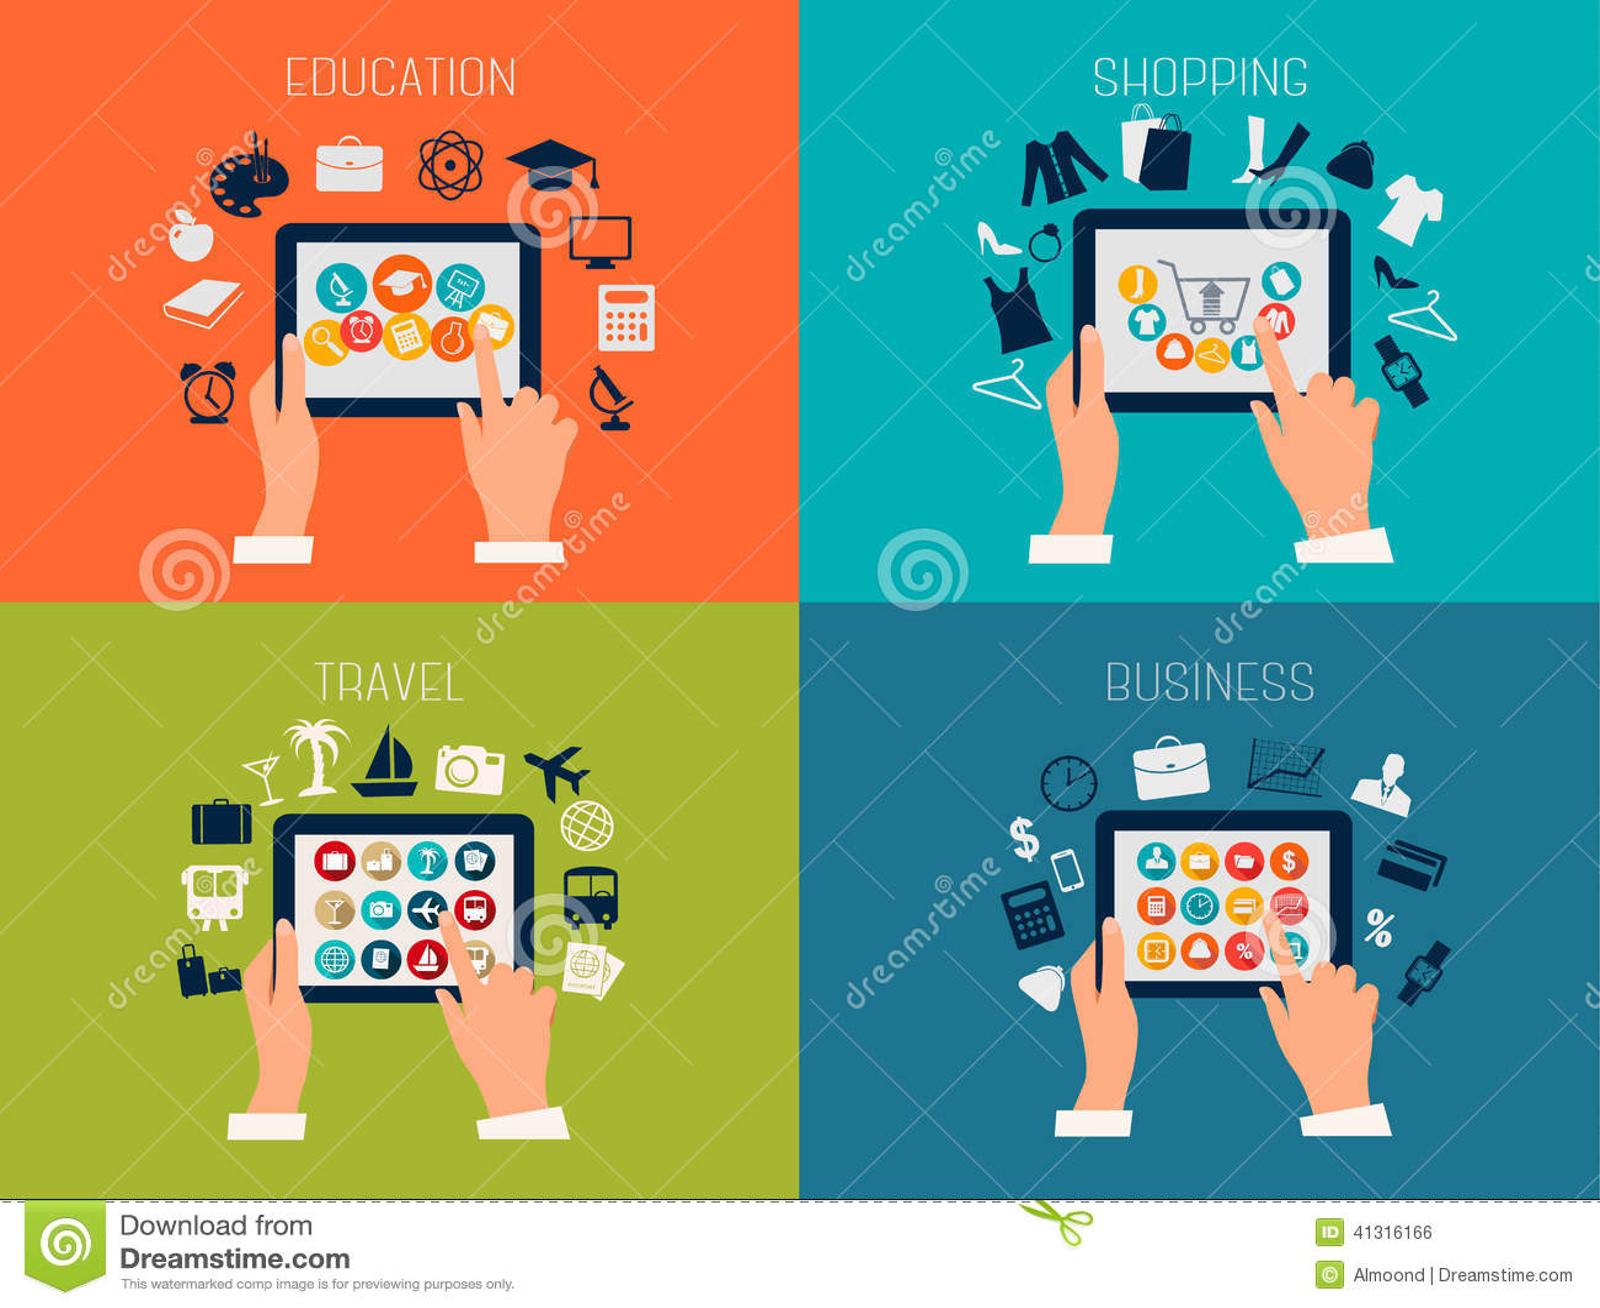 Set Of Flat Design Backgrounds For Education, Business